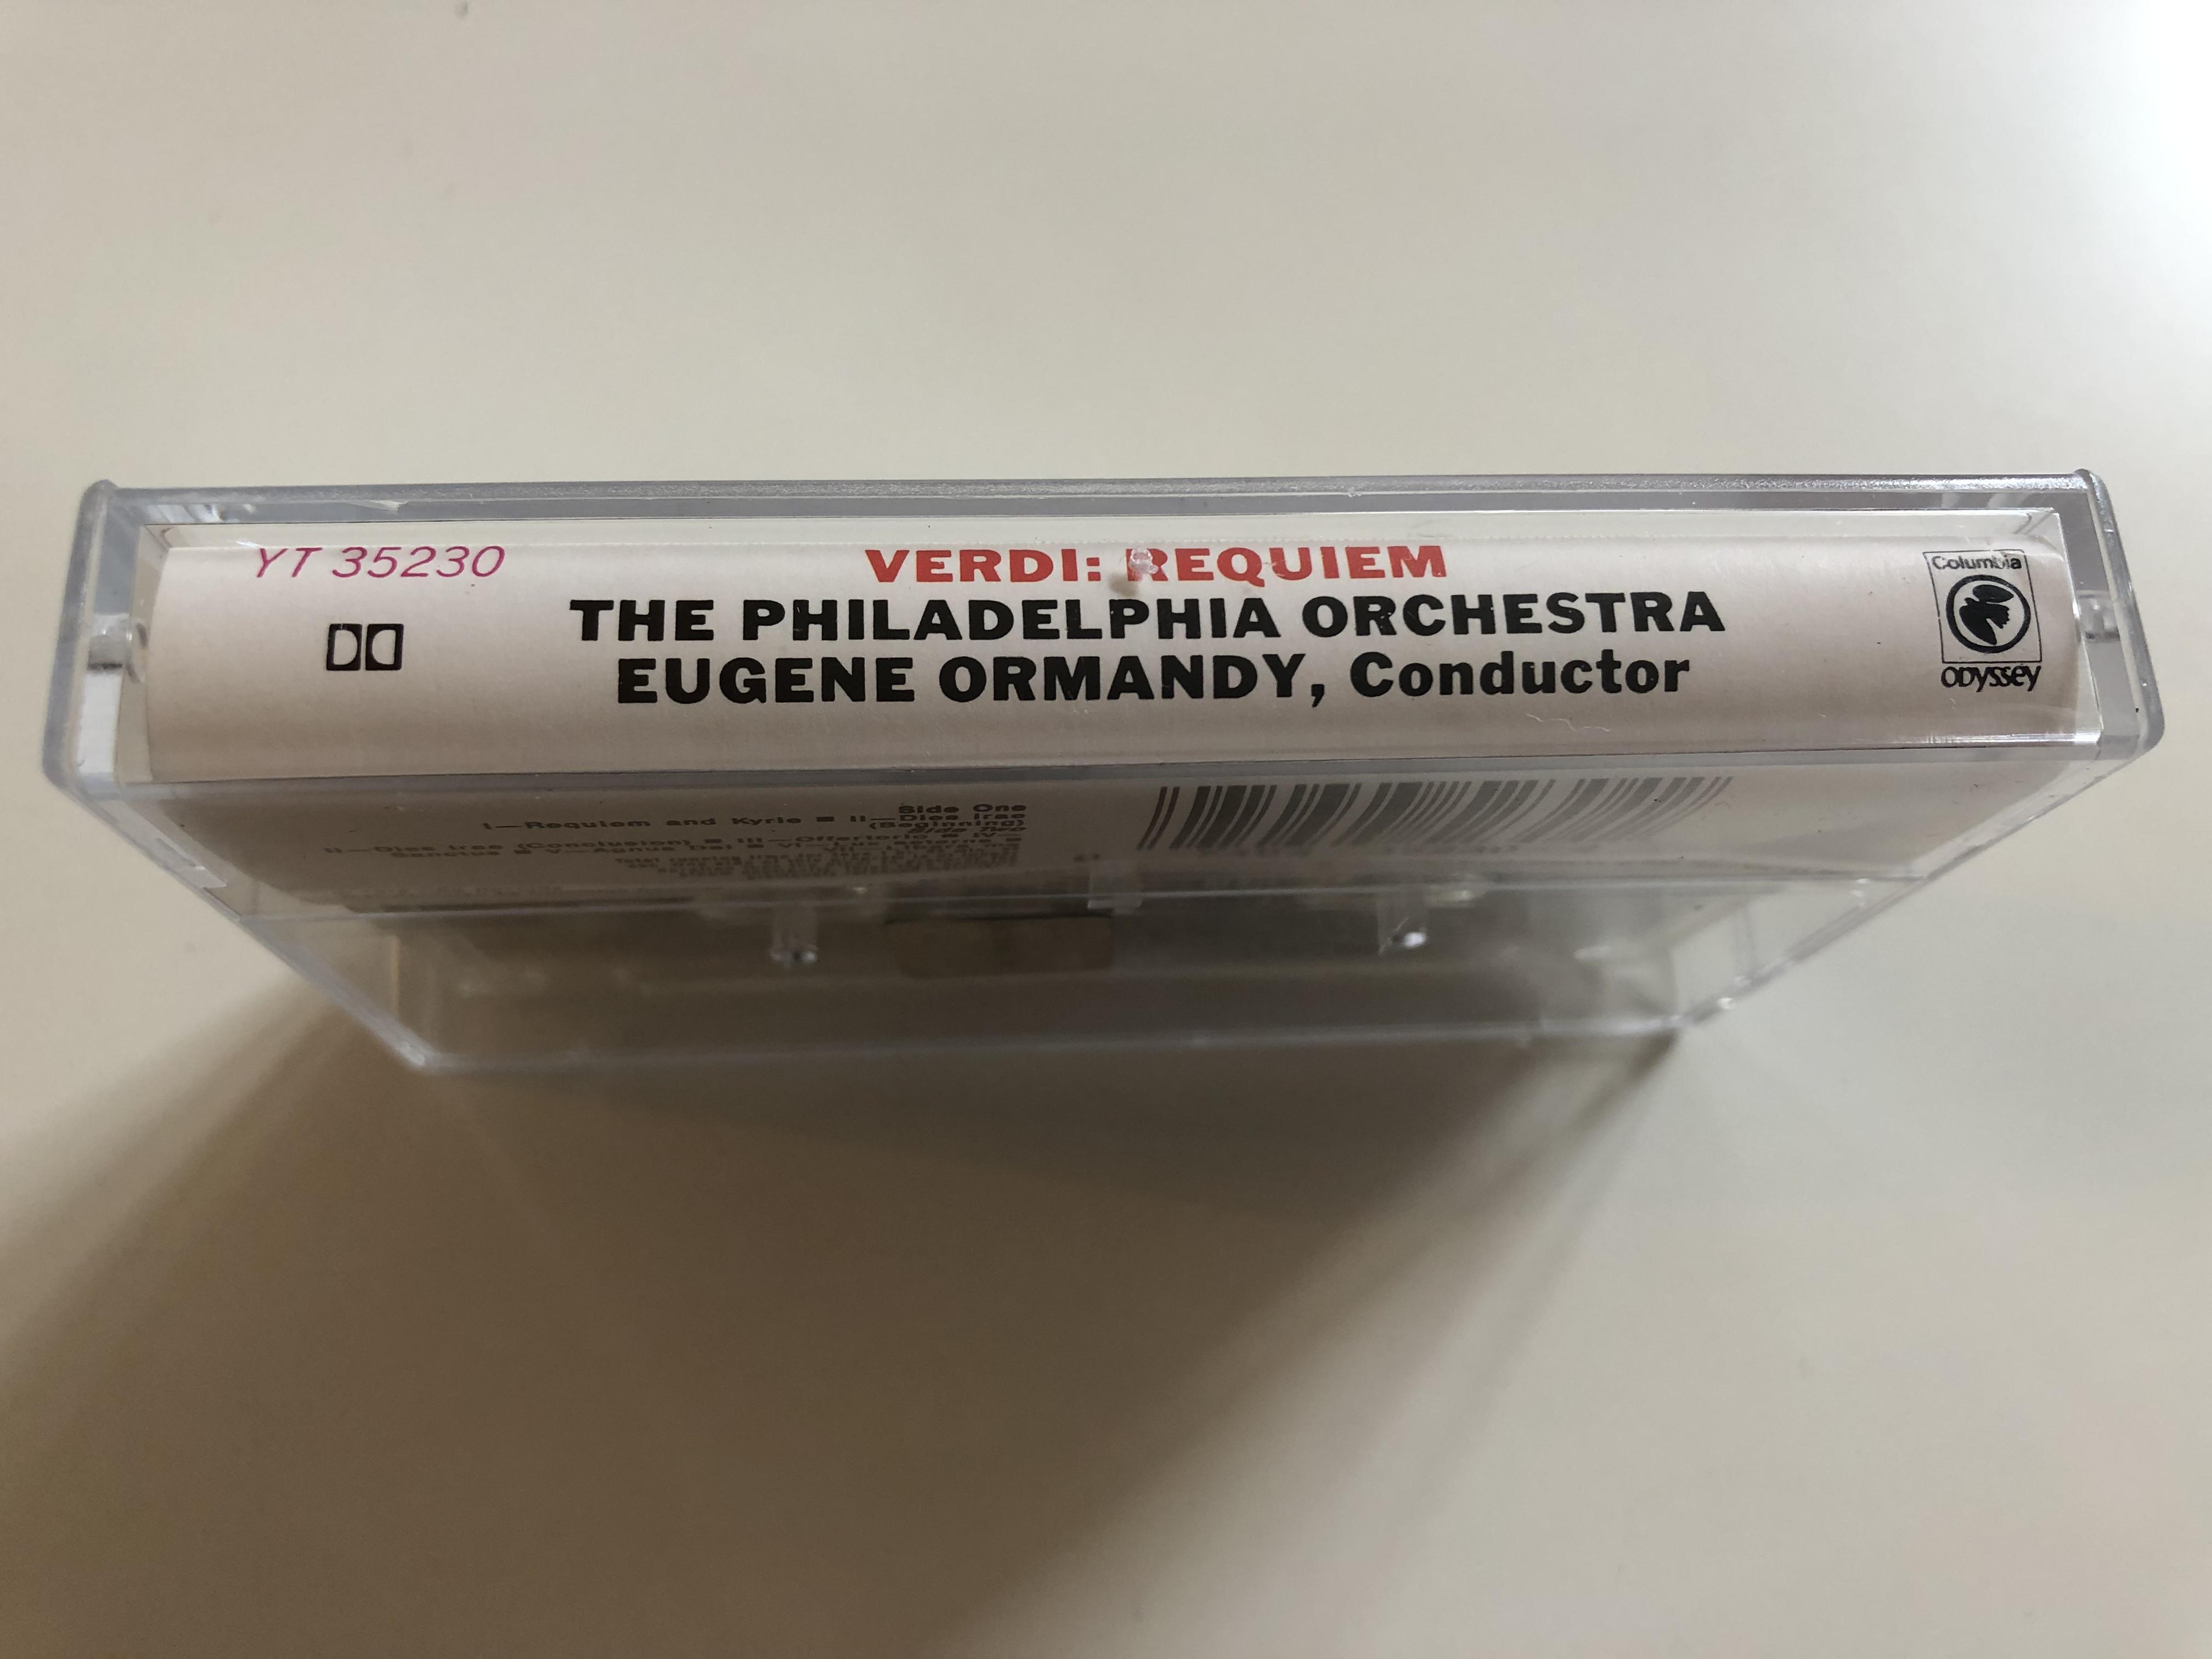 verdi-requiem-the-philadelphia-orchestra-conducted-eugene-ormandy-the-westminster-choir-odyssey-cassette-stereo-yt-35230-4-.jpg